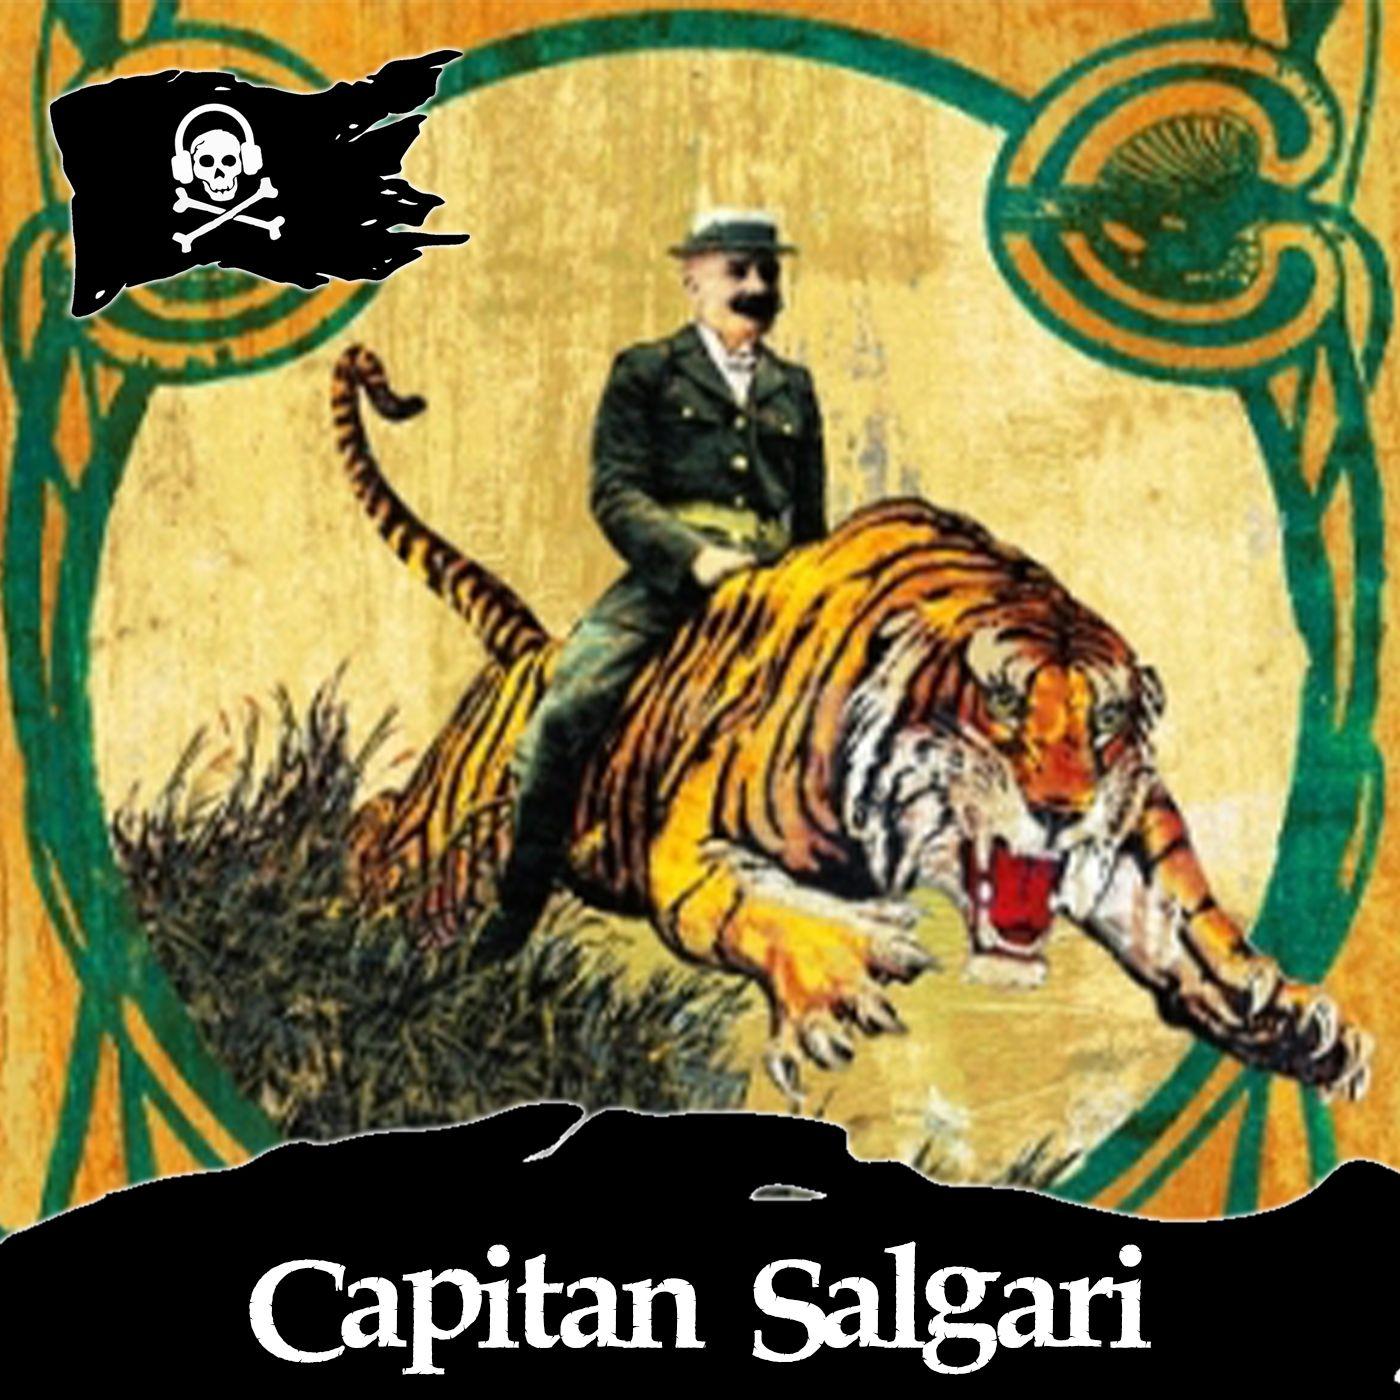 44 - Capitan Salgari